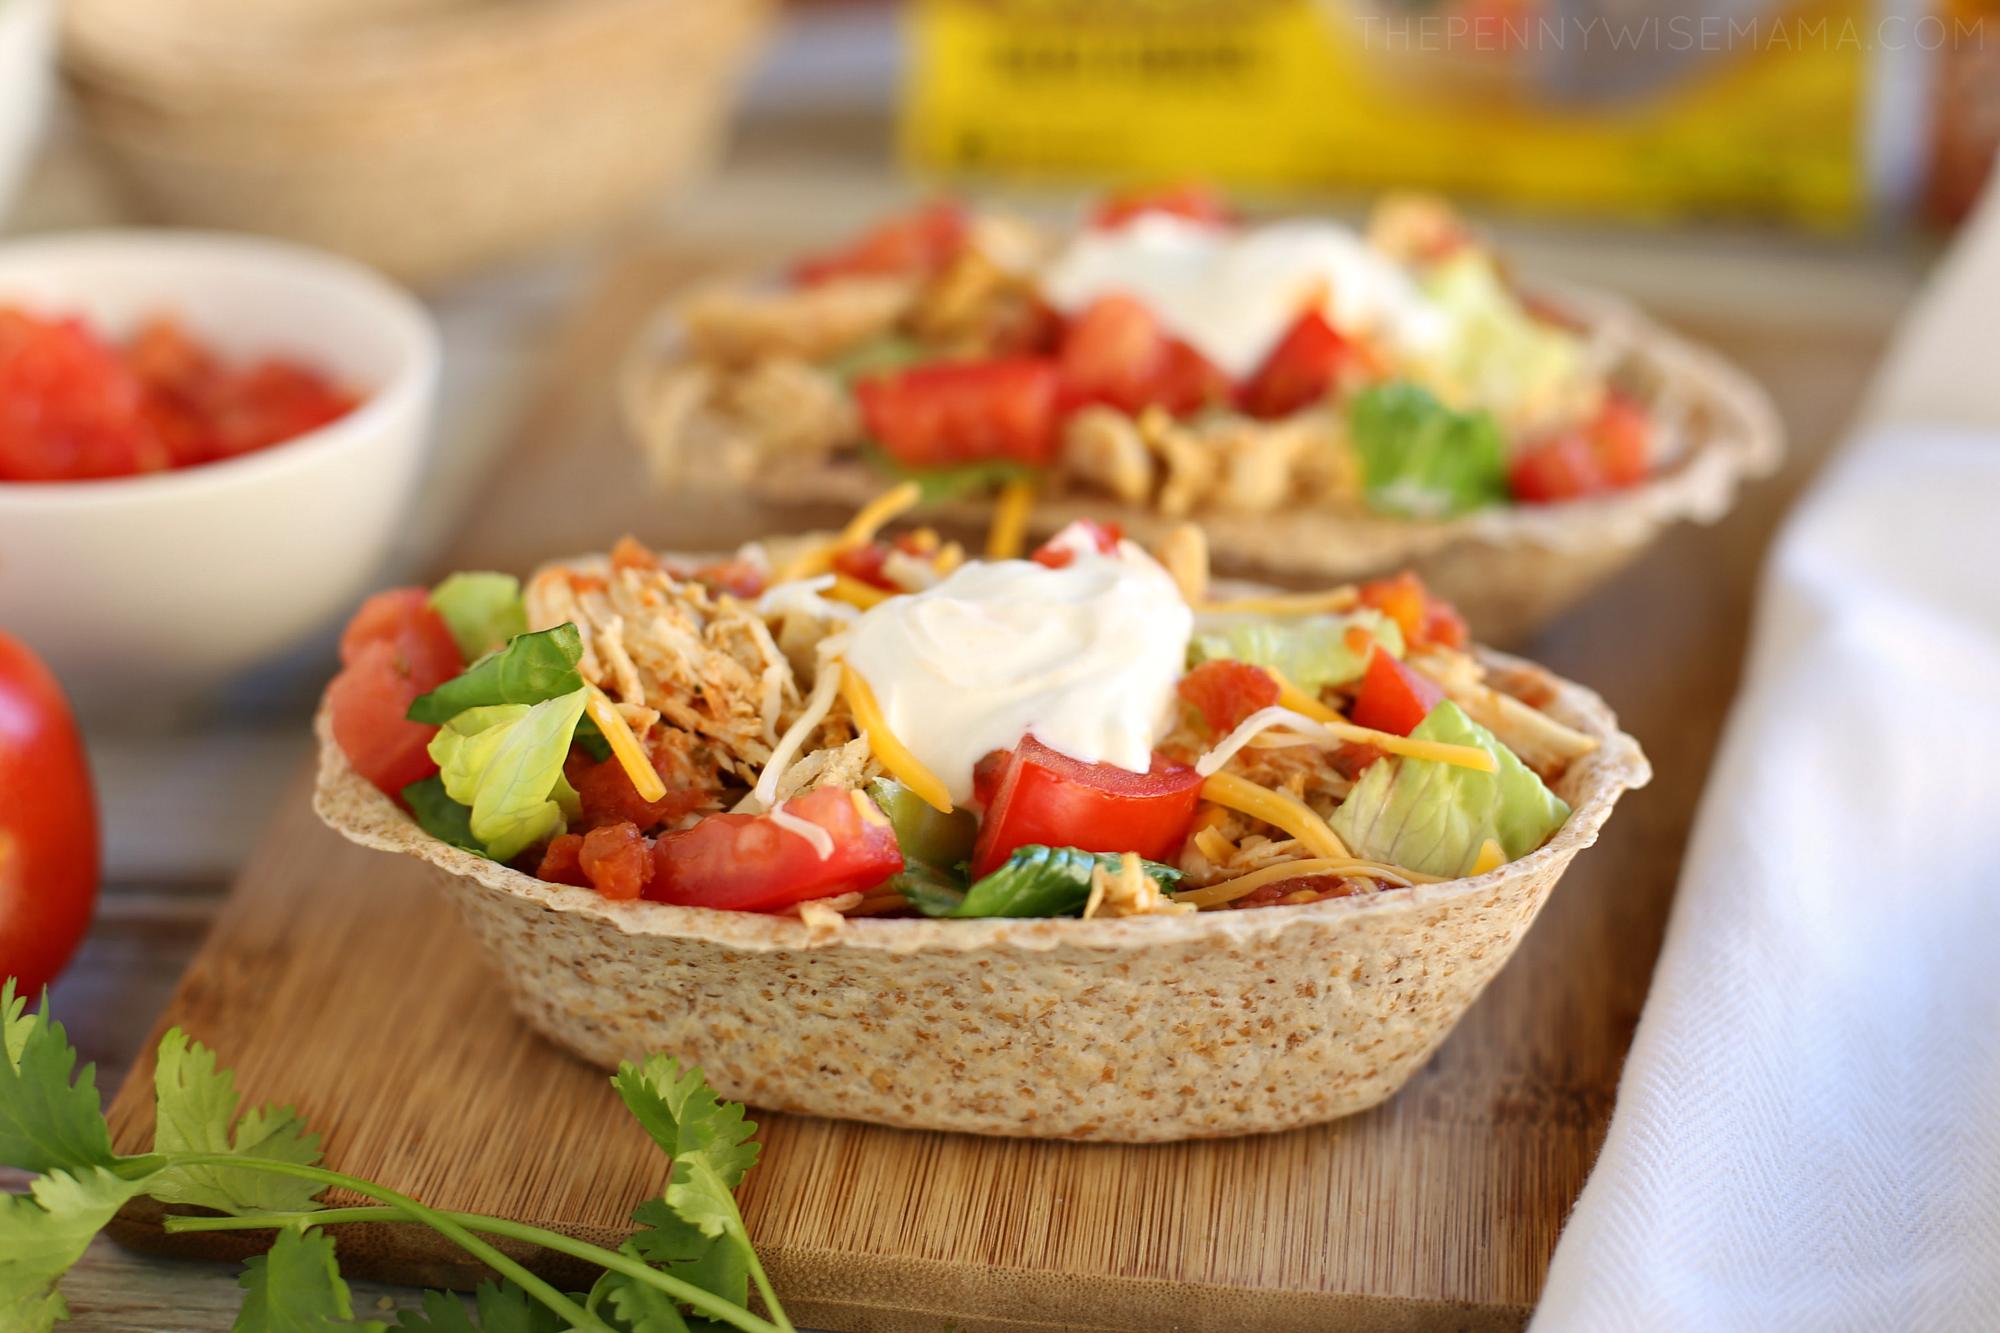 Slow Cooker Tex-Mex Chicken Burrito Bowls